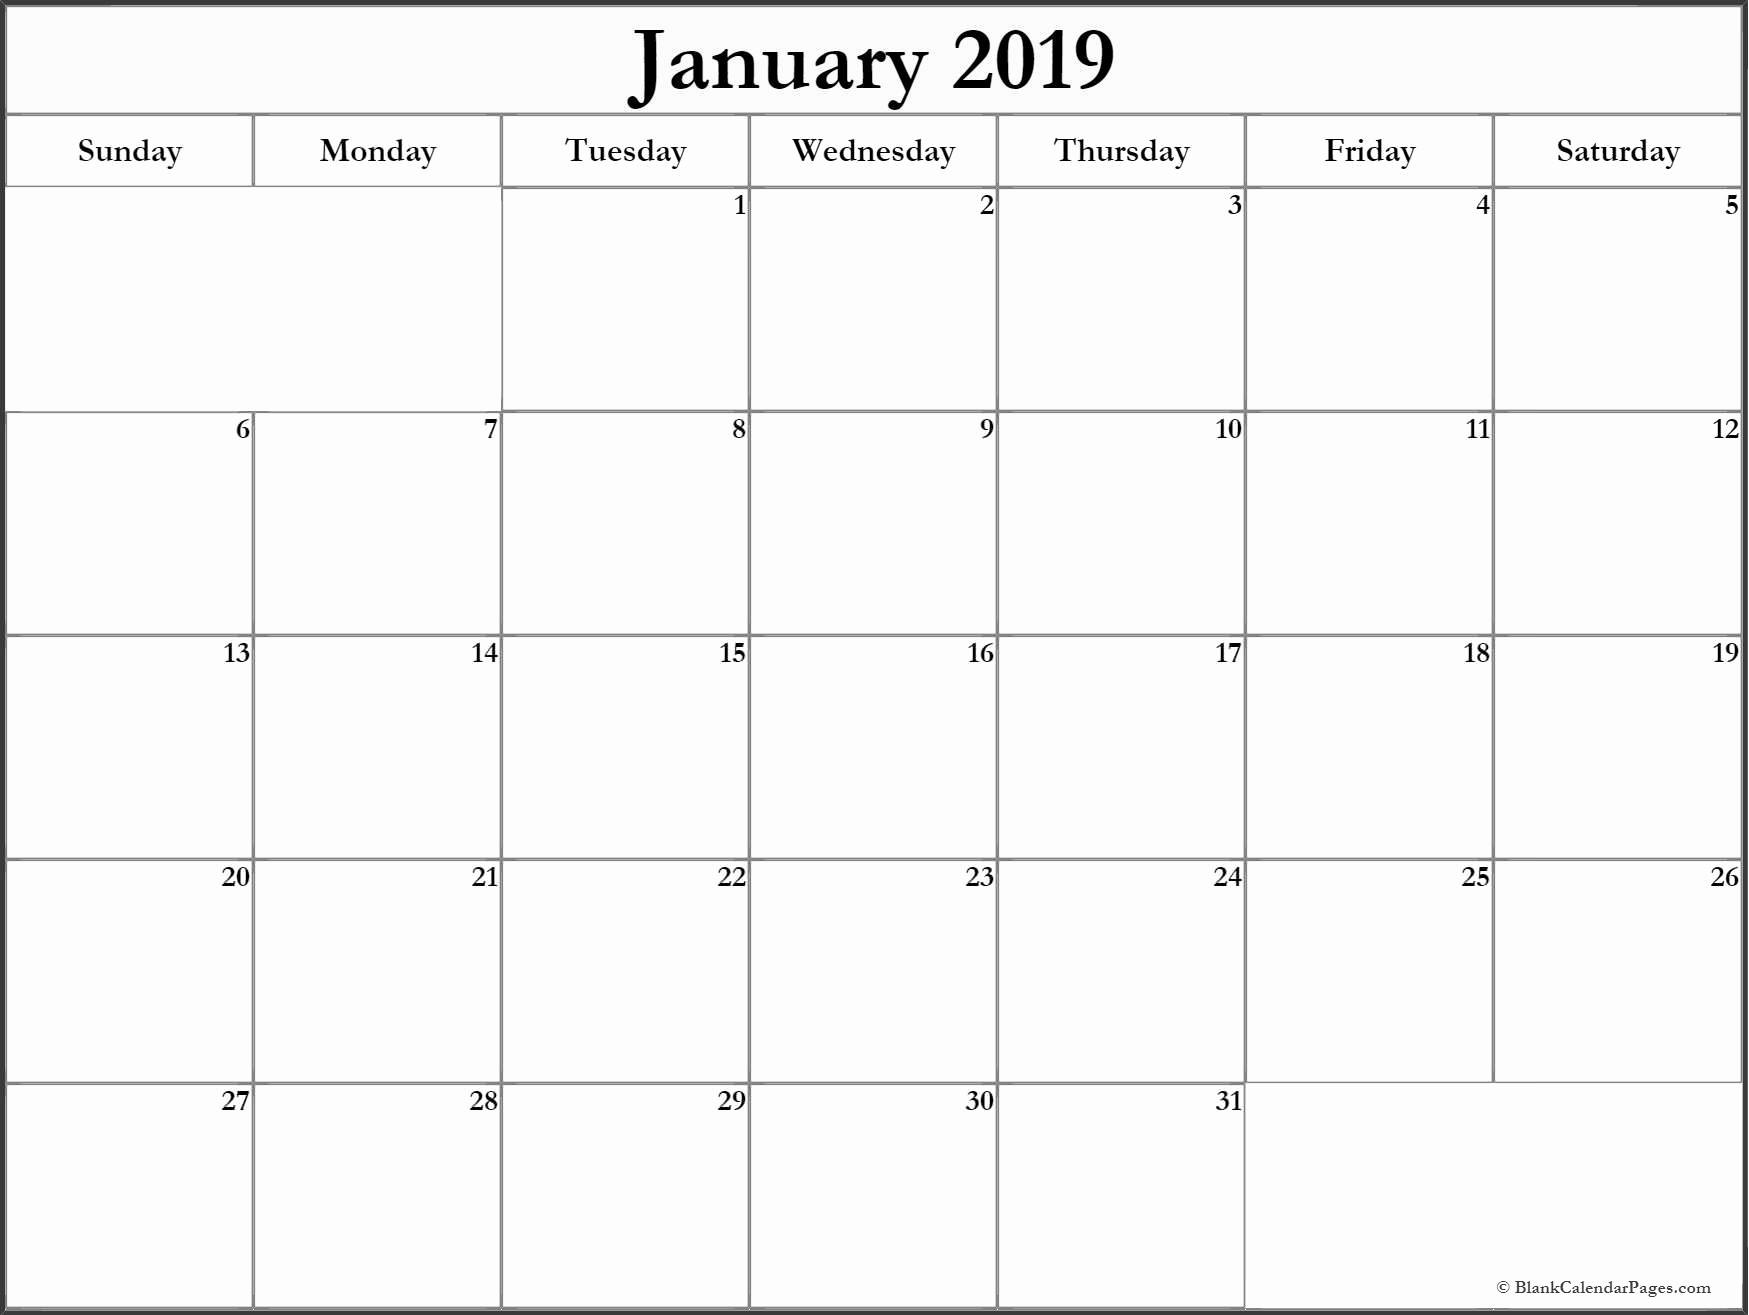 Blank January 2019 Calendar Template New January 2019 Blank Calendar Templates